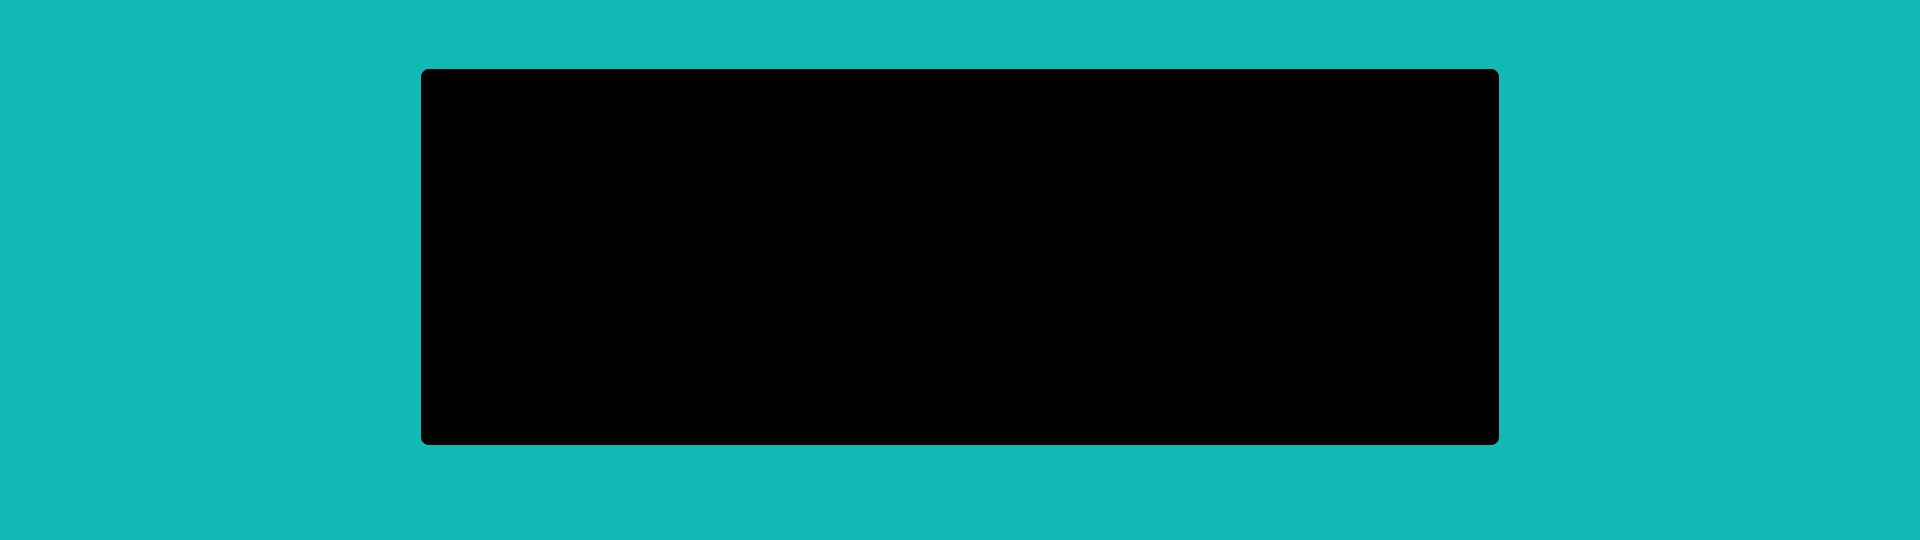 CATEGORY-AYCAN-KISINDIRIMILUMBERJACKSEPETTE40INDIRIM-25-02